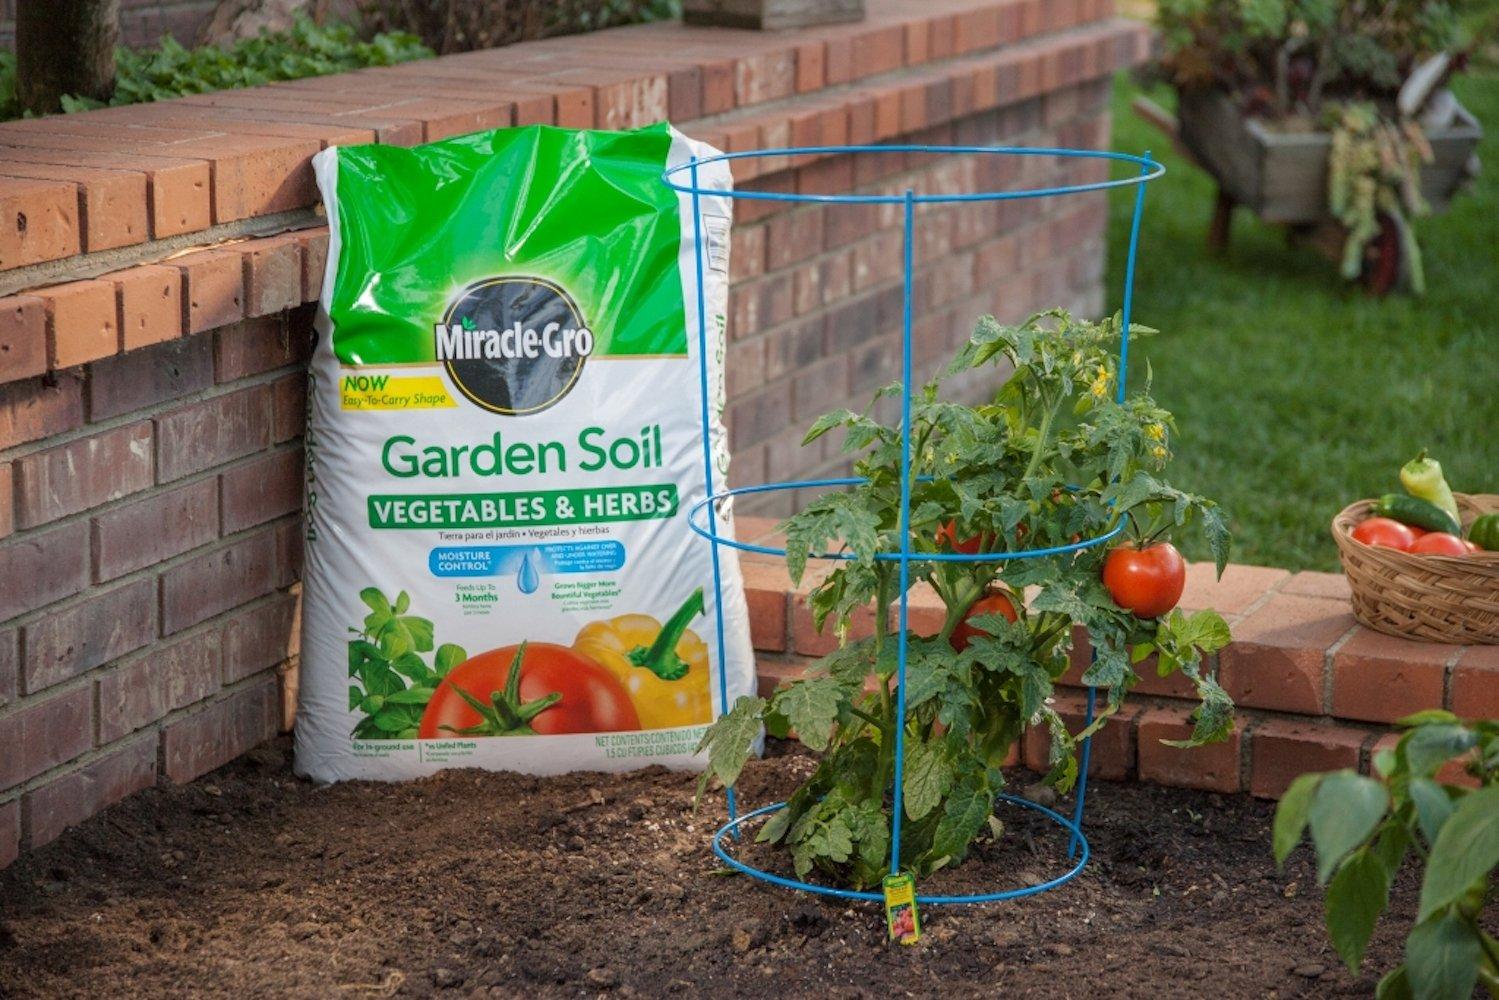 amazoncom miracle gro 73759430 garden soil vegetables herbs 15 cf garden outdoor - Vegetable Garden Soil